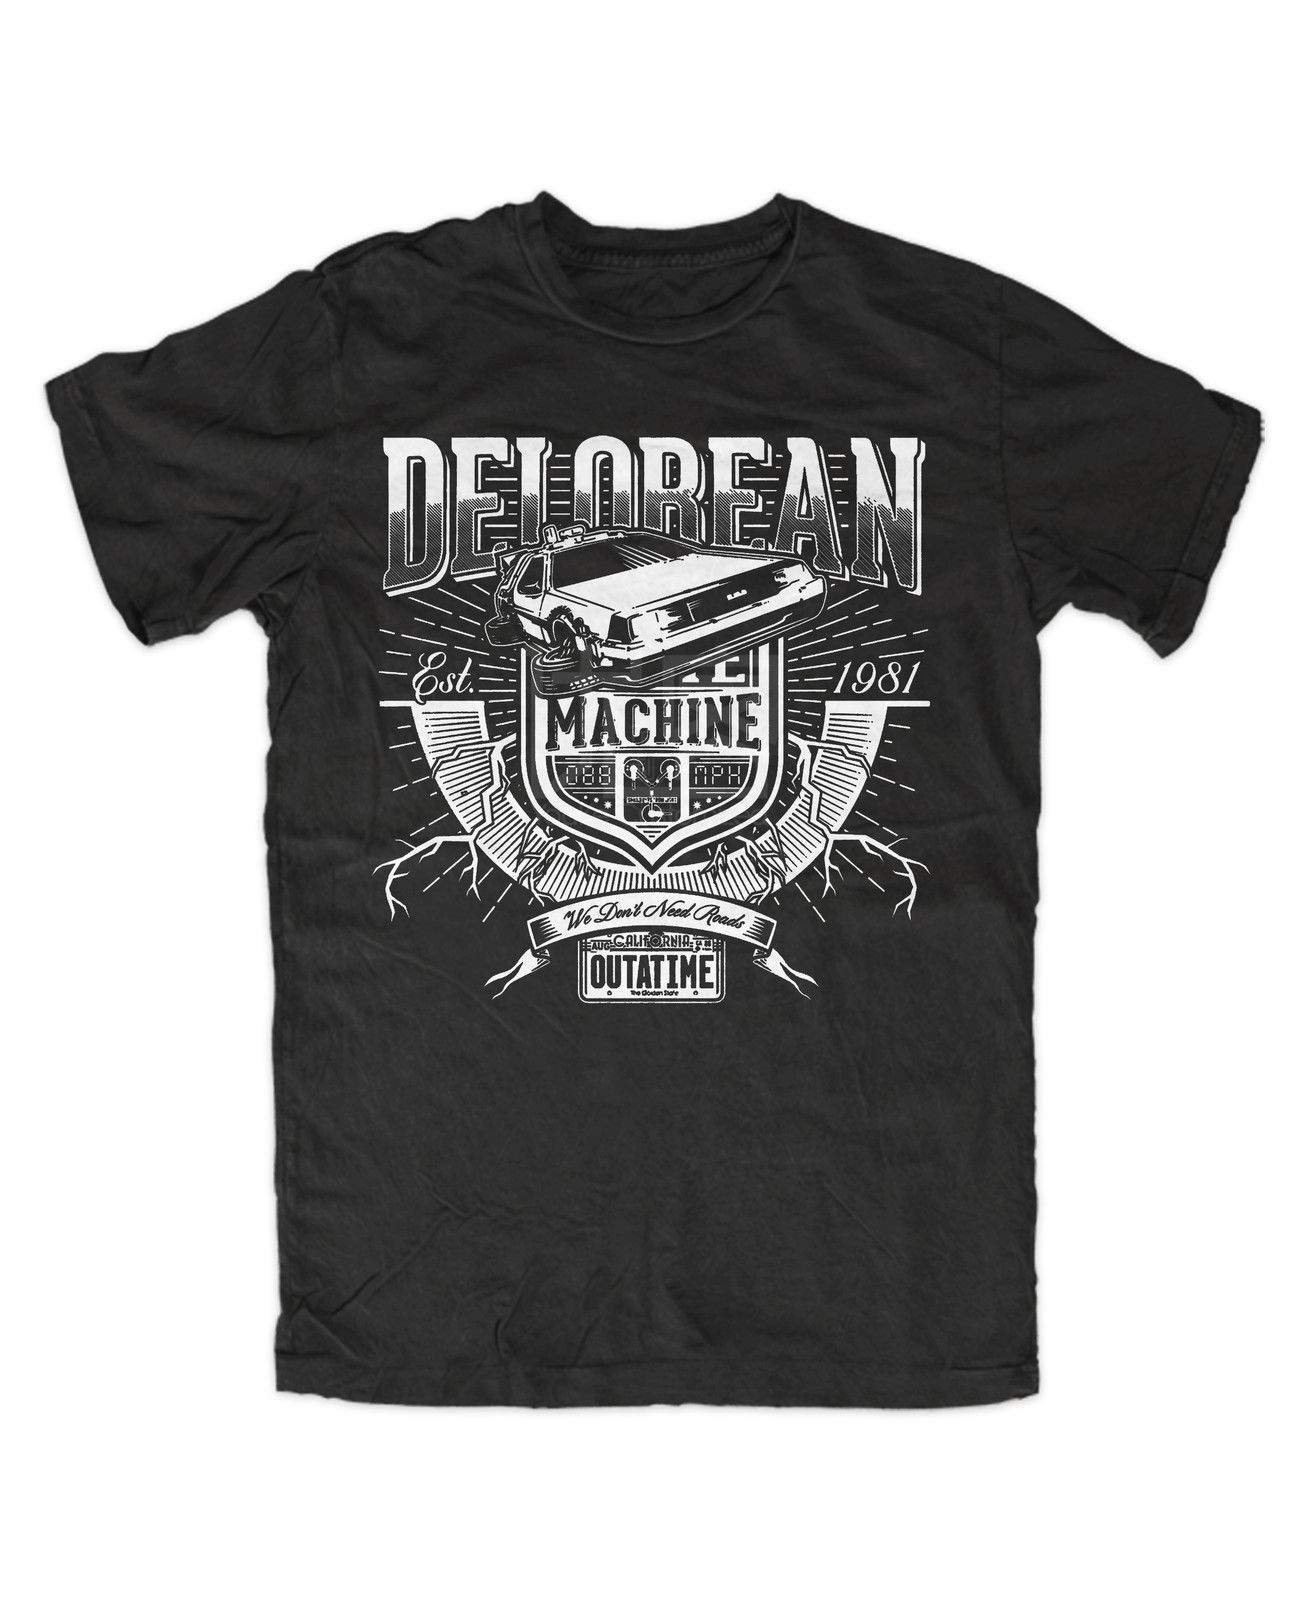 Delorean Premium T-Shirt Schwarz , Back To The Future , Timemachine 100% Cotton Men Women T Shirt Tees Custom Fashion 2018 S-3xl